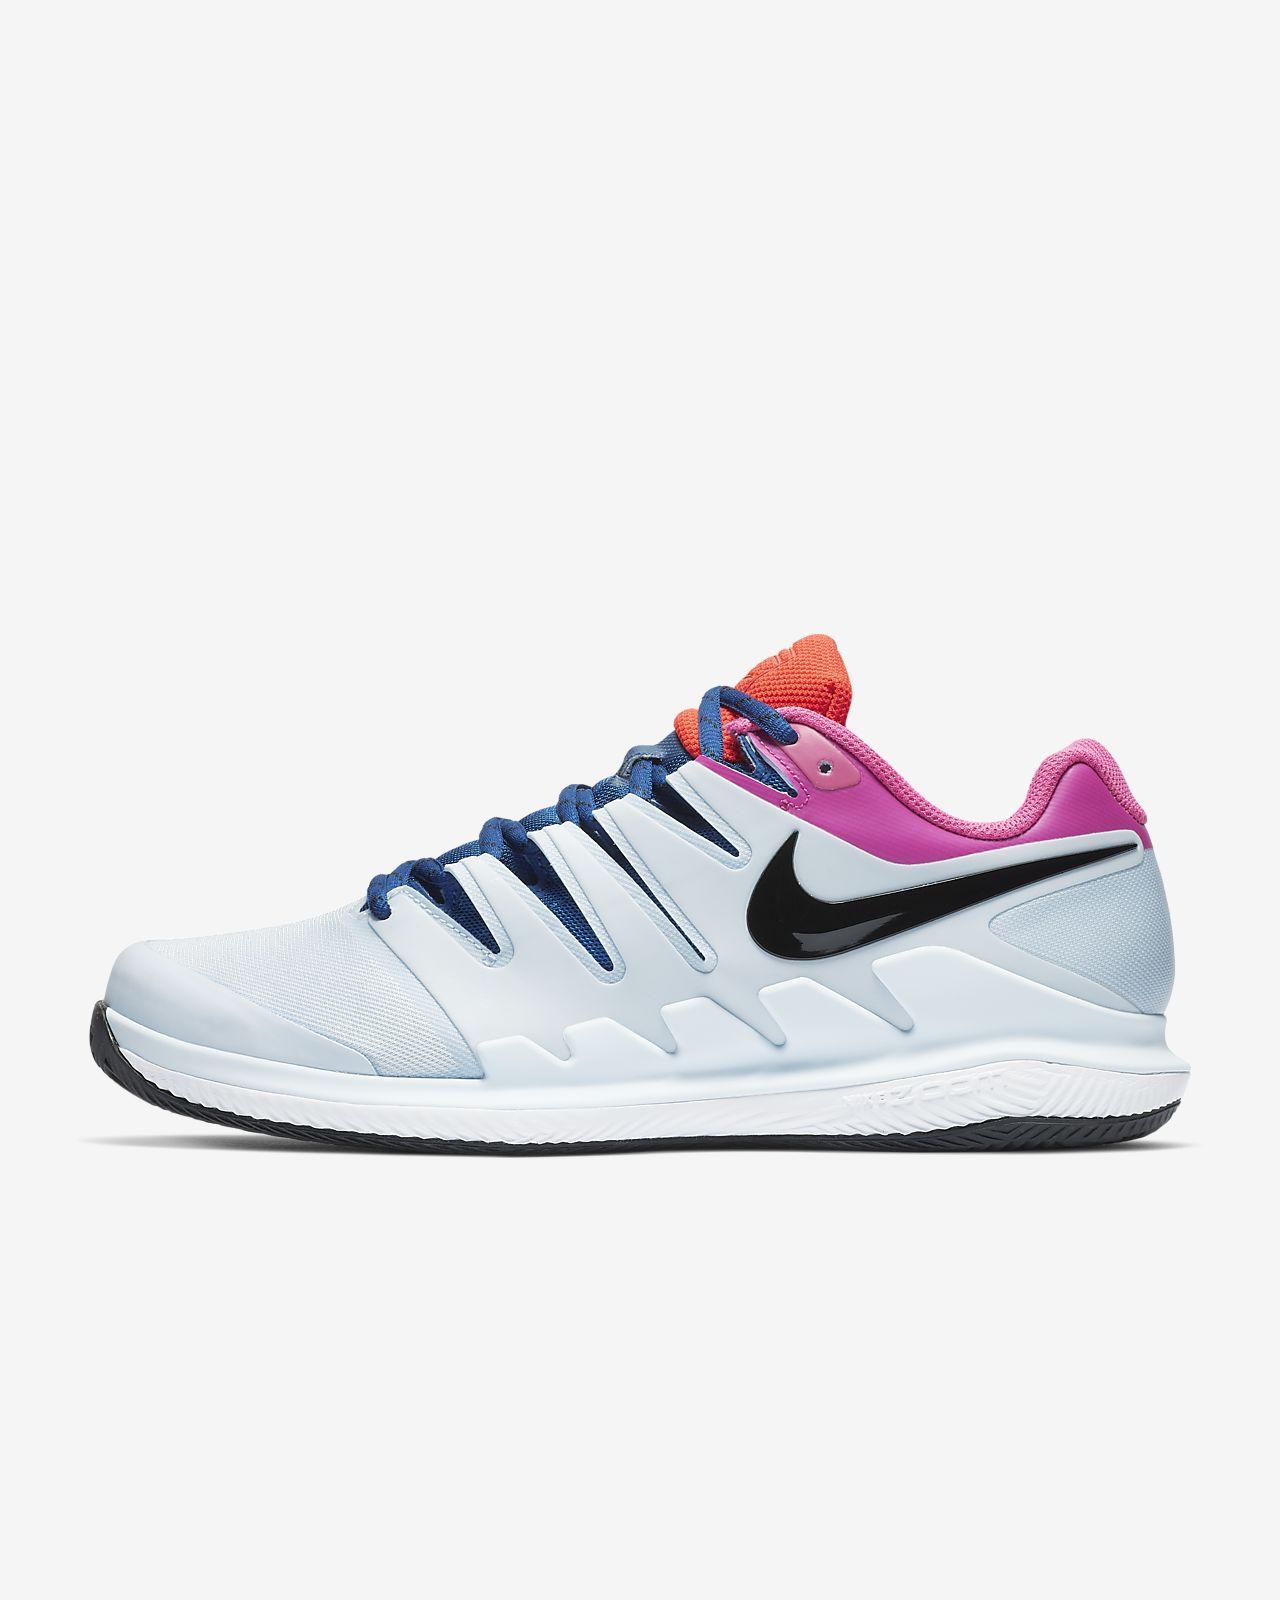 57ffc2a8706 Chaussure de tennis Nike Air Zoom Vapor X Clay pour Homme. Nike.com BE